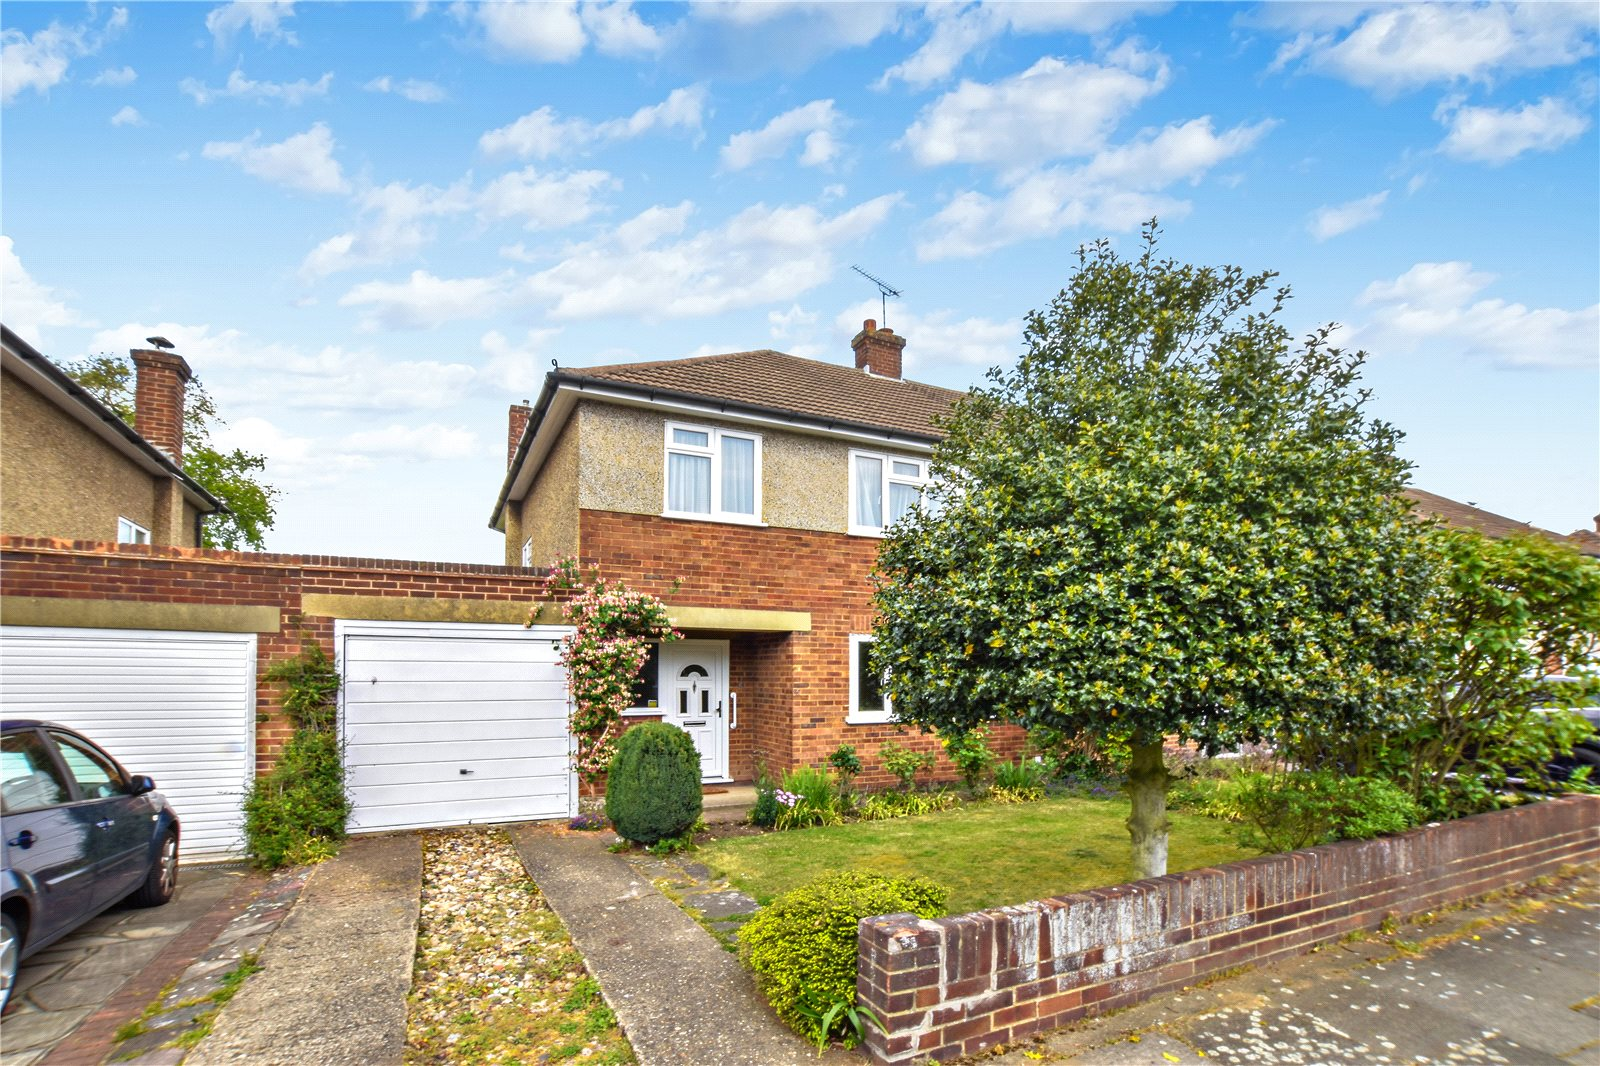 Ravenswood, Bexley, Kent, DA5